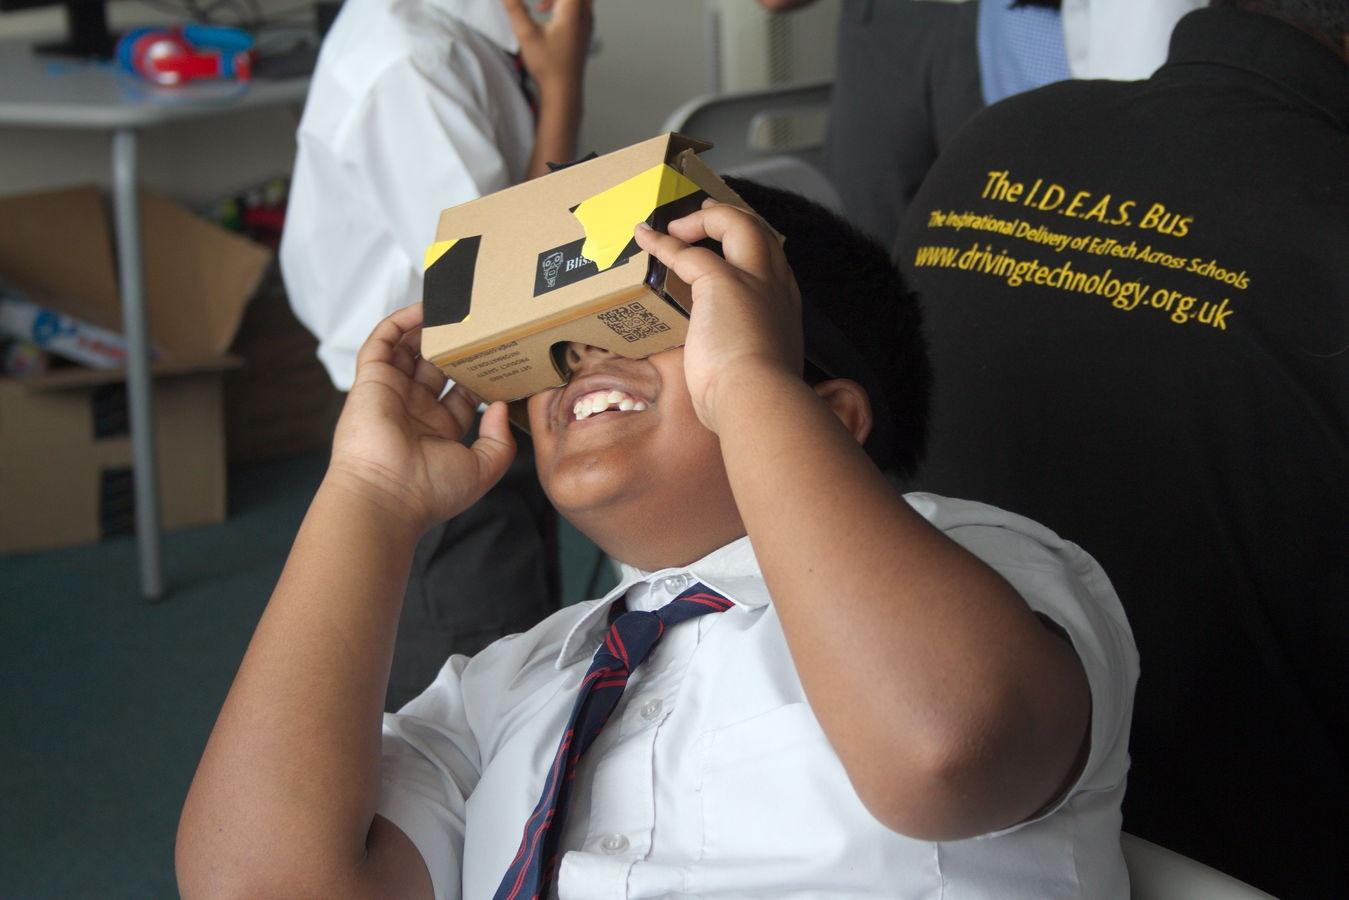 Child using VR headset